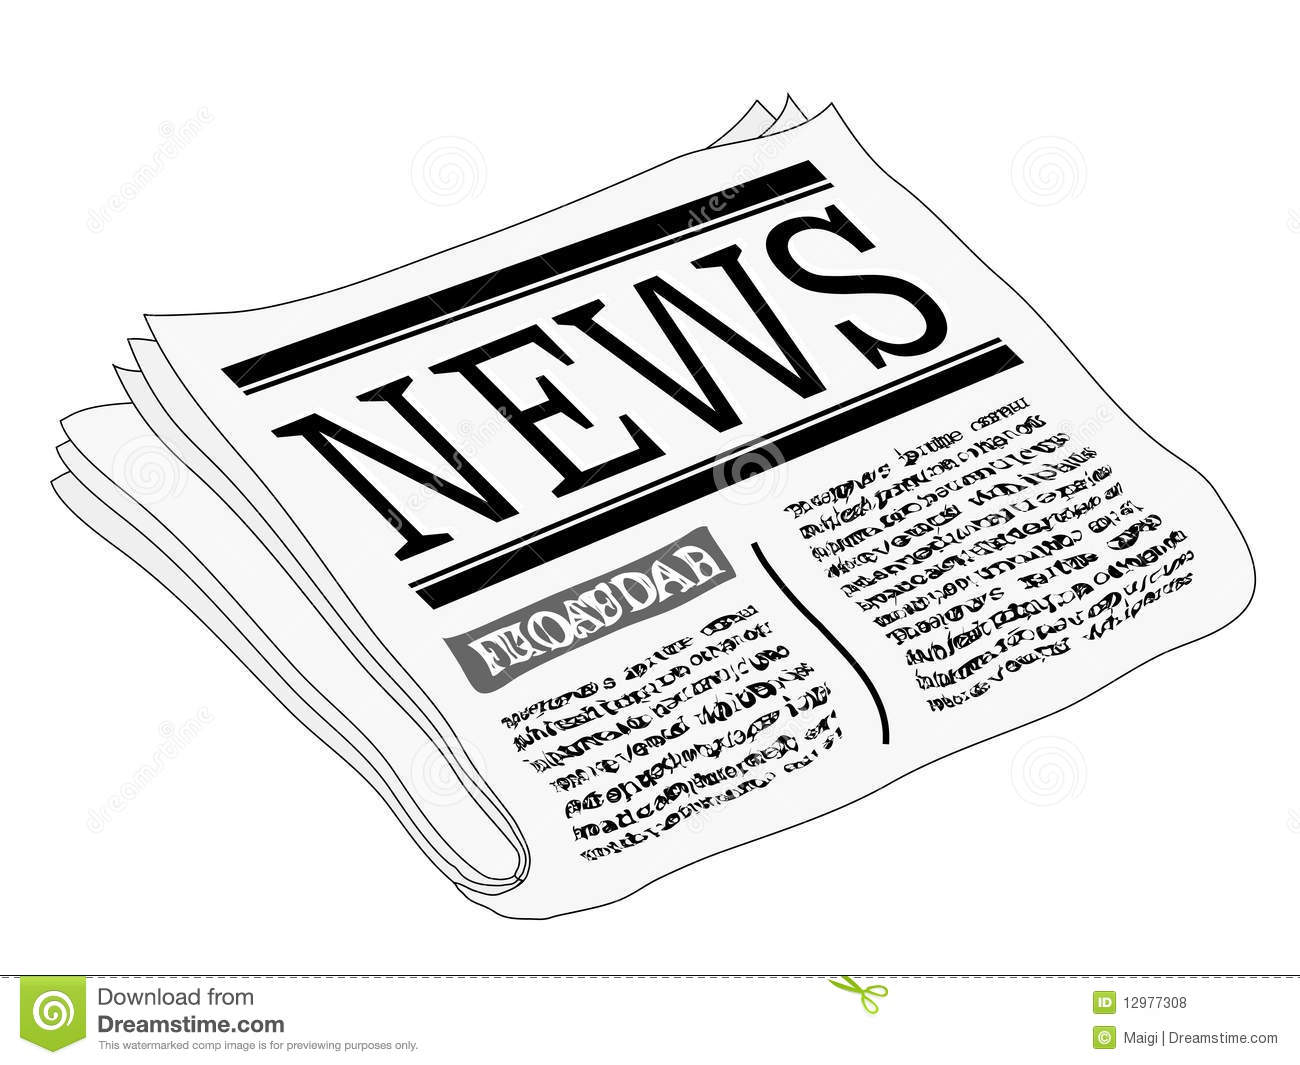 newspaper-clipart-newspaper-12977308